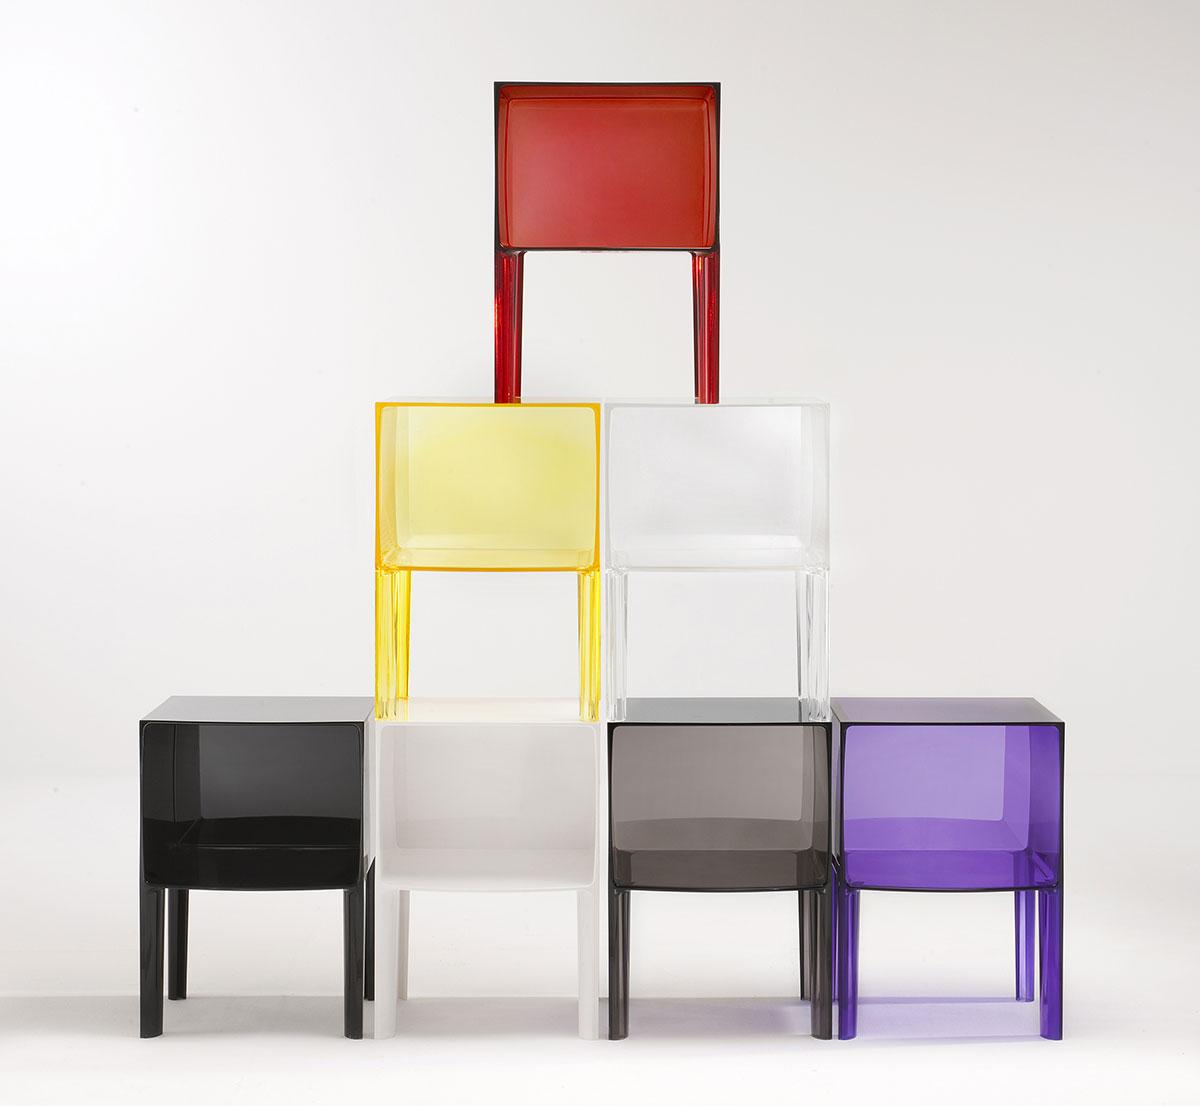 chevet small ghost buster par kartell. Black Bedroom Furniture Sets. Home Design Ideas